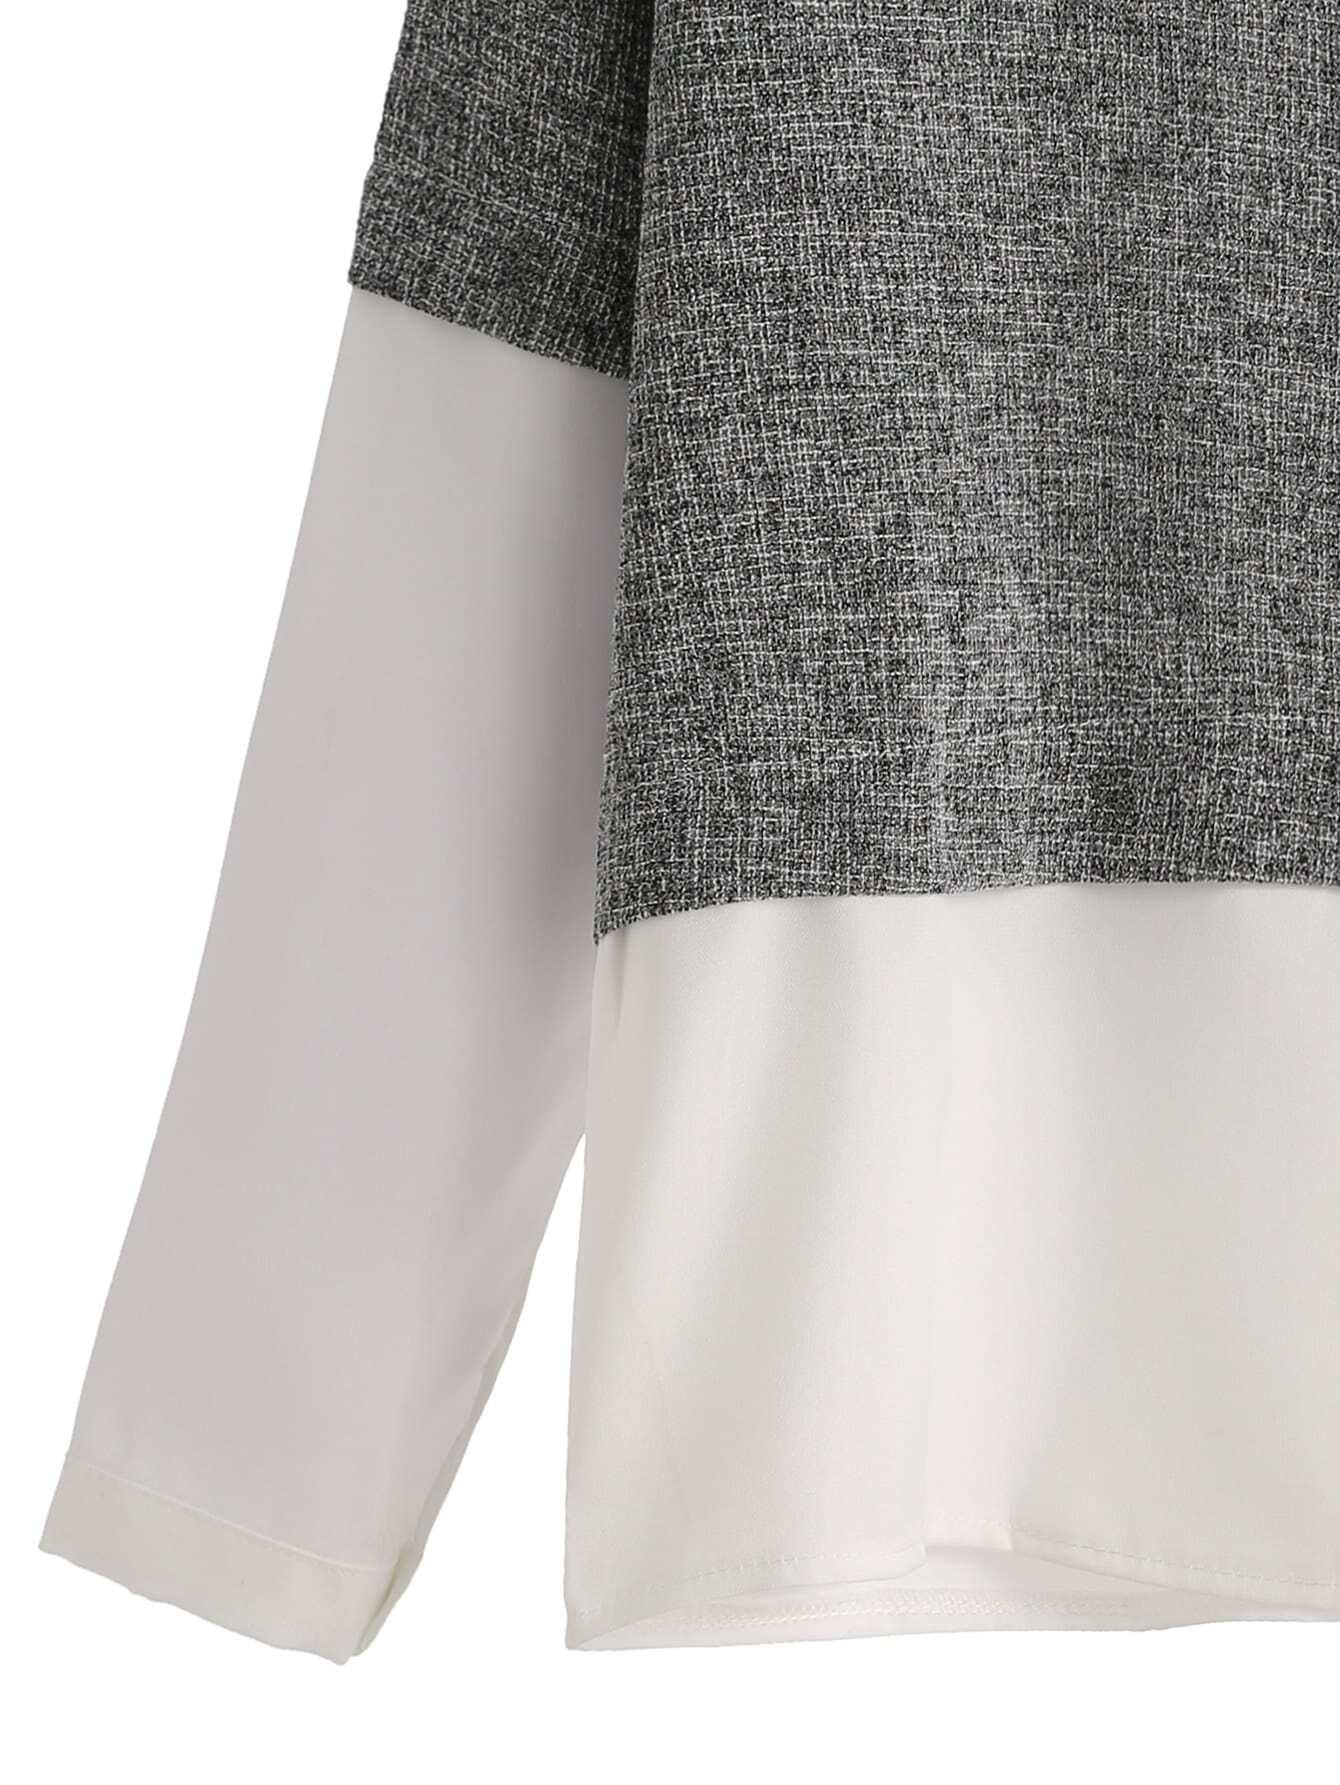 blouse160906122_2